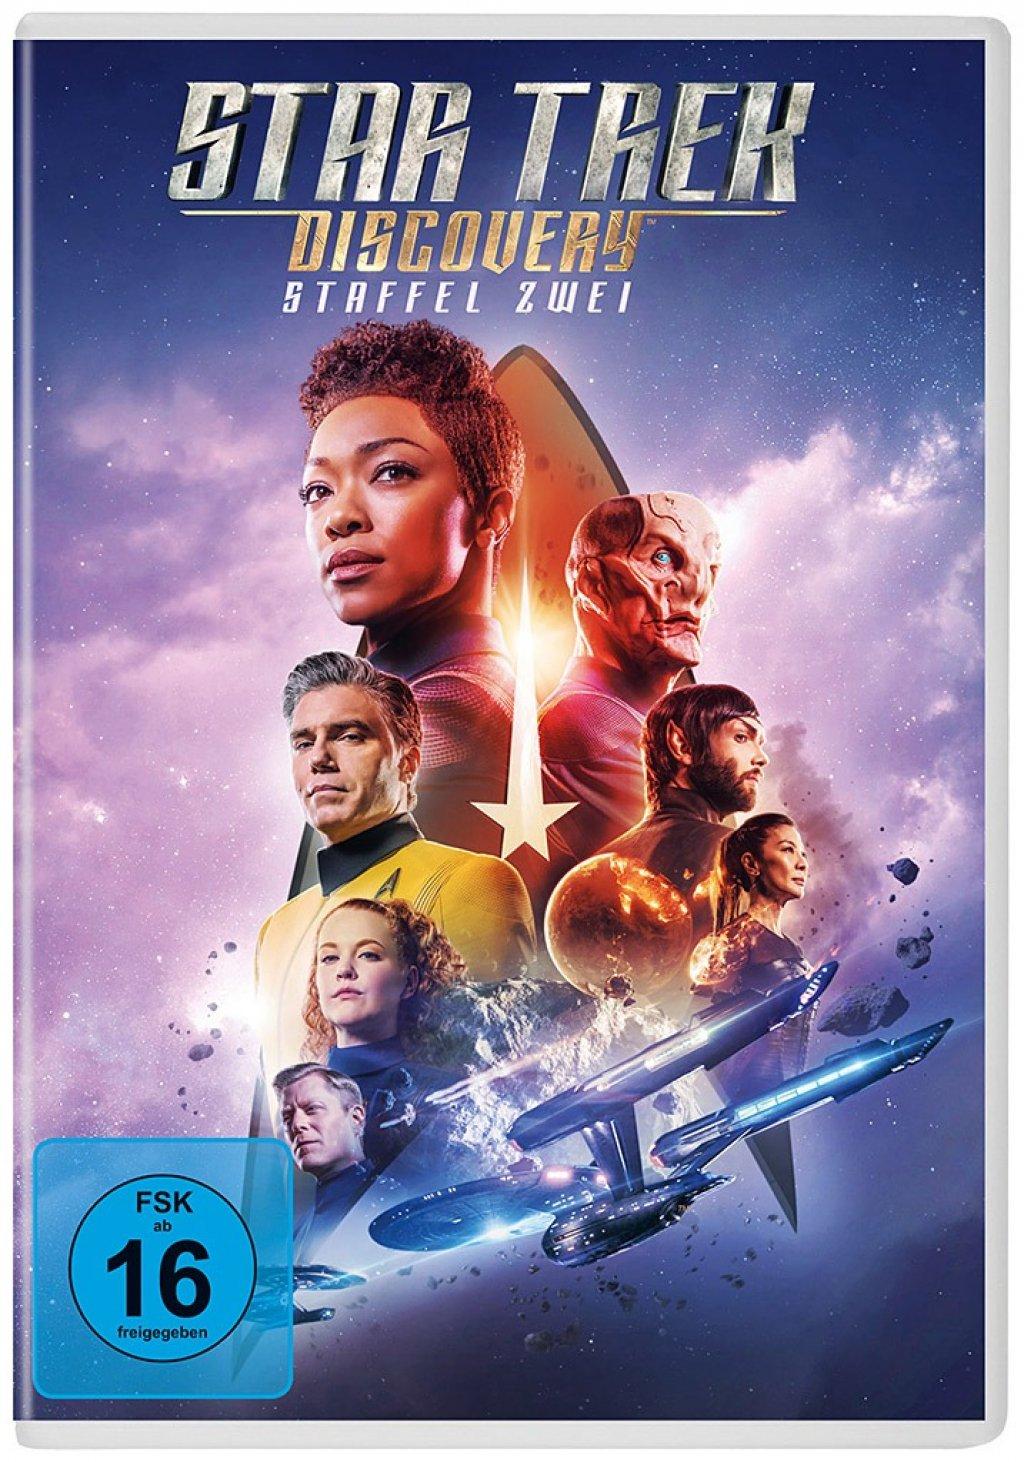 Star Trek Discovery Schauspieler